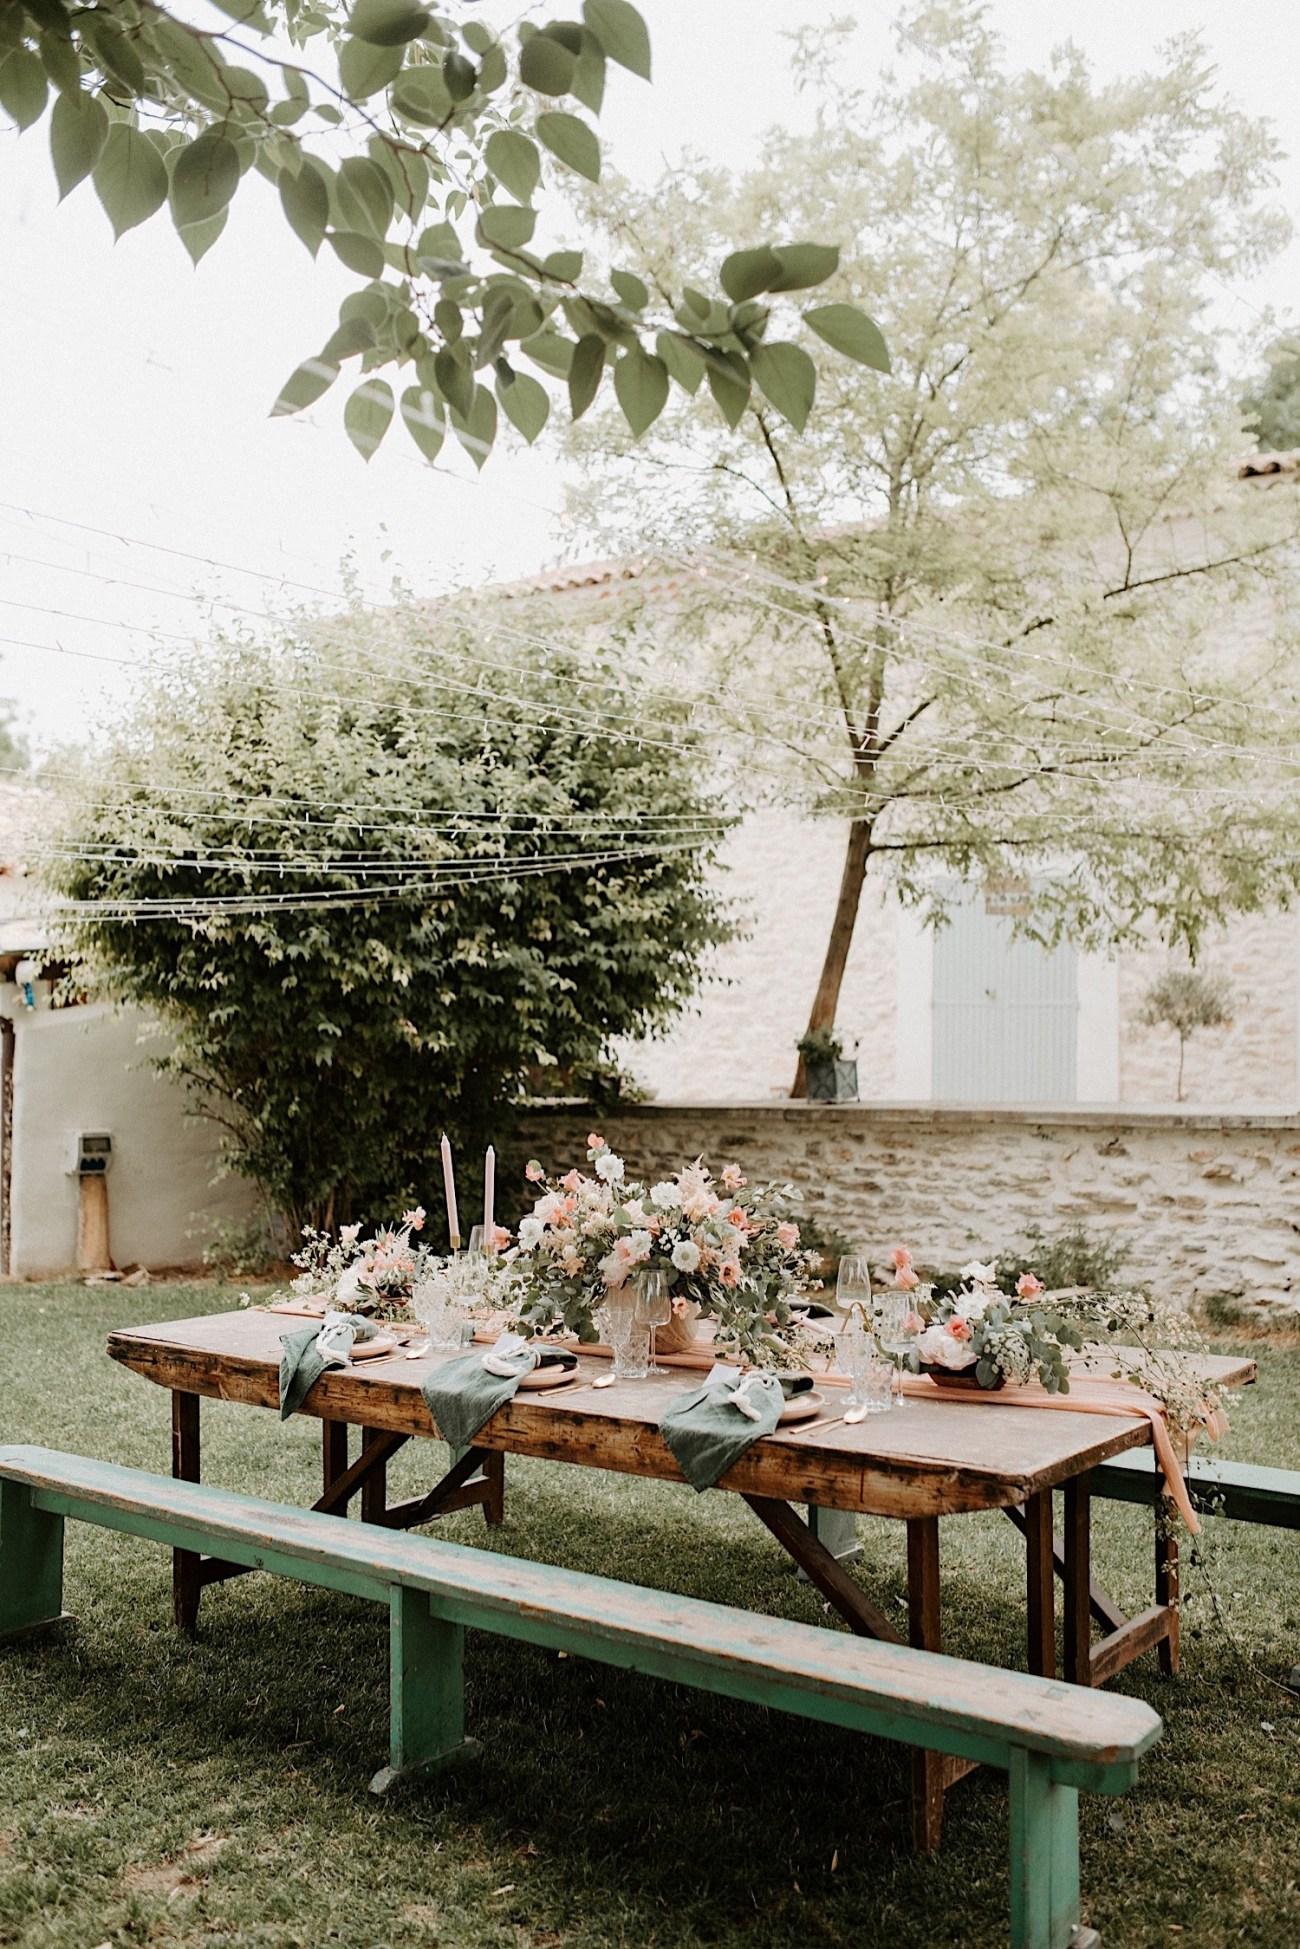 Terre Ugo Un Marriage En Provence Lavender Field Wedding French Wedding Provence Wedding Destination Wedding France Photographe De Marriage Provence France Anais Possamai Photography 05